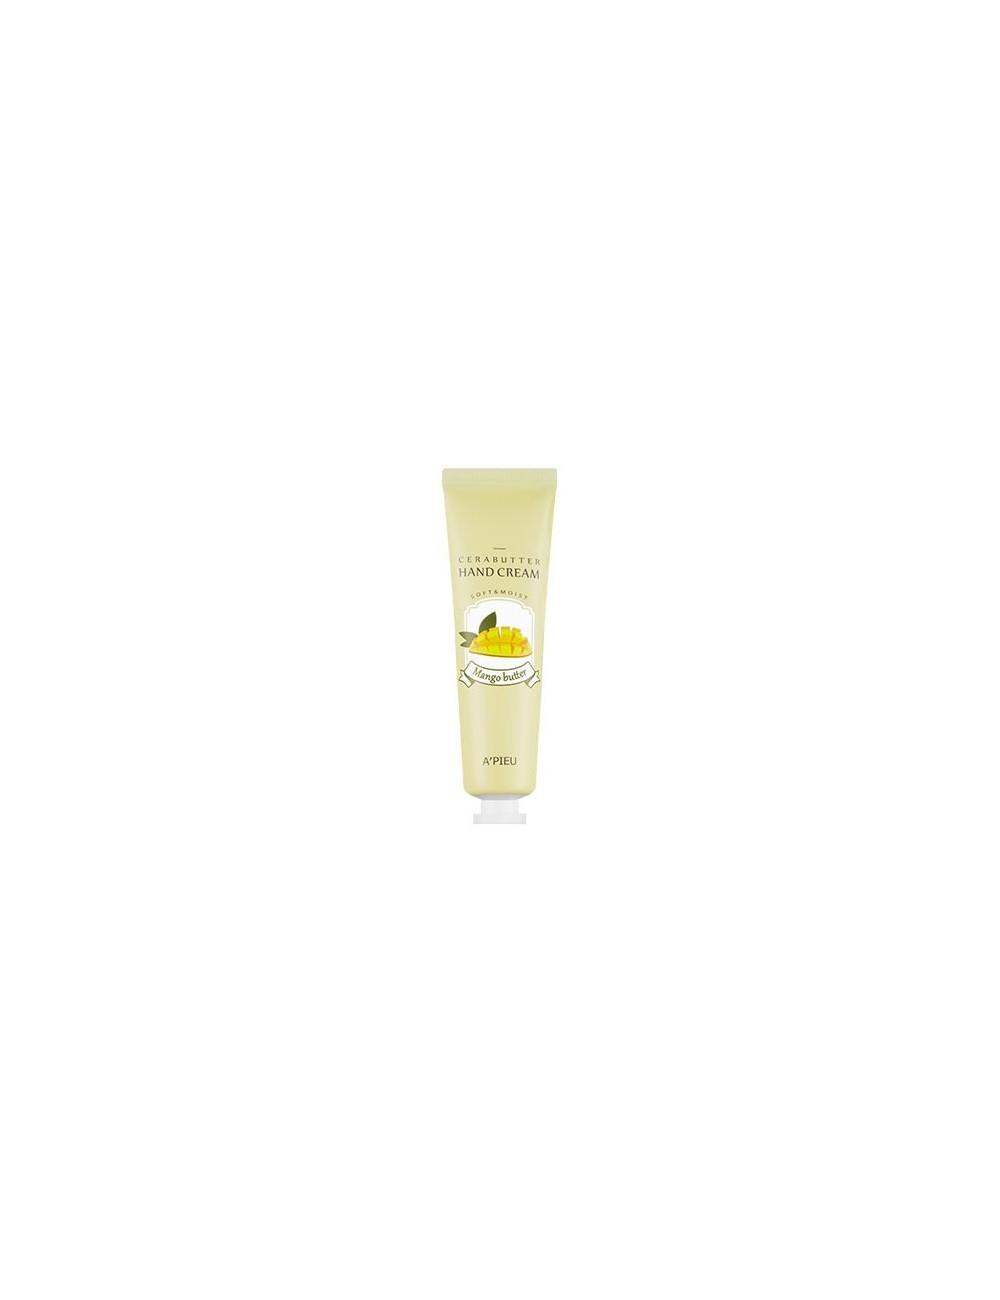 Crema de Manos A'pieu Cerabutter Hand Cream (Mango Butter)